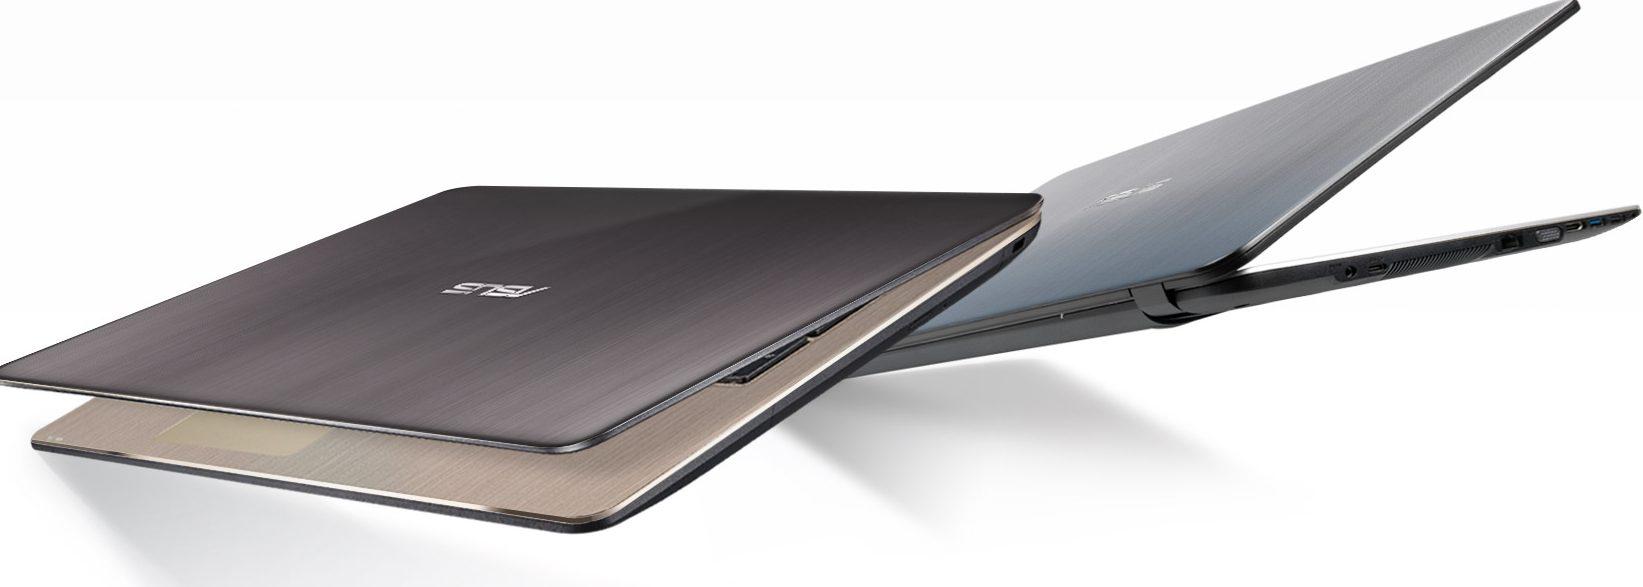 لپ تاپ ایسوس مدل VivoBook X540YA-C